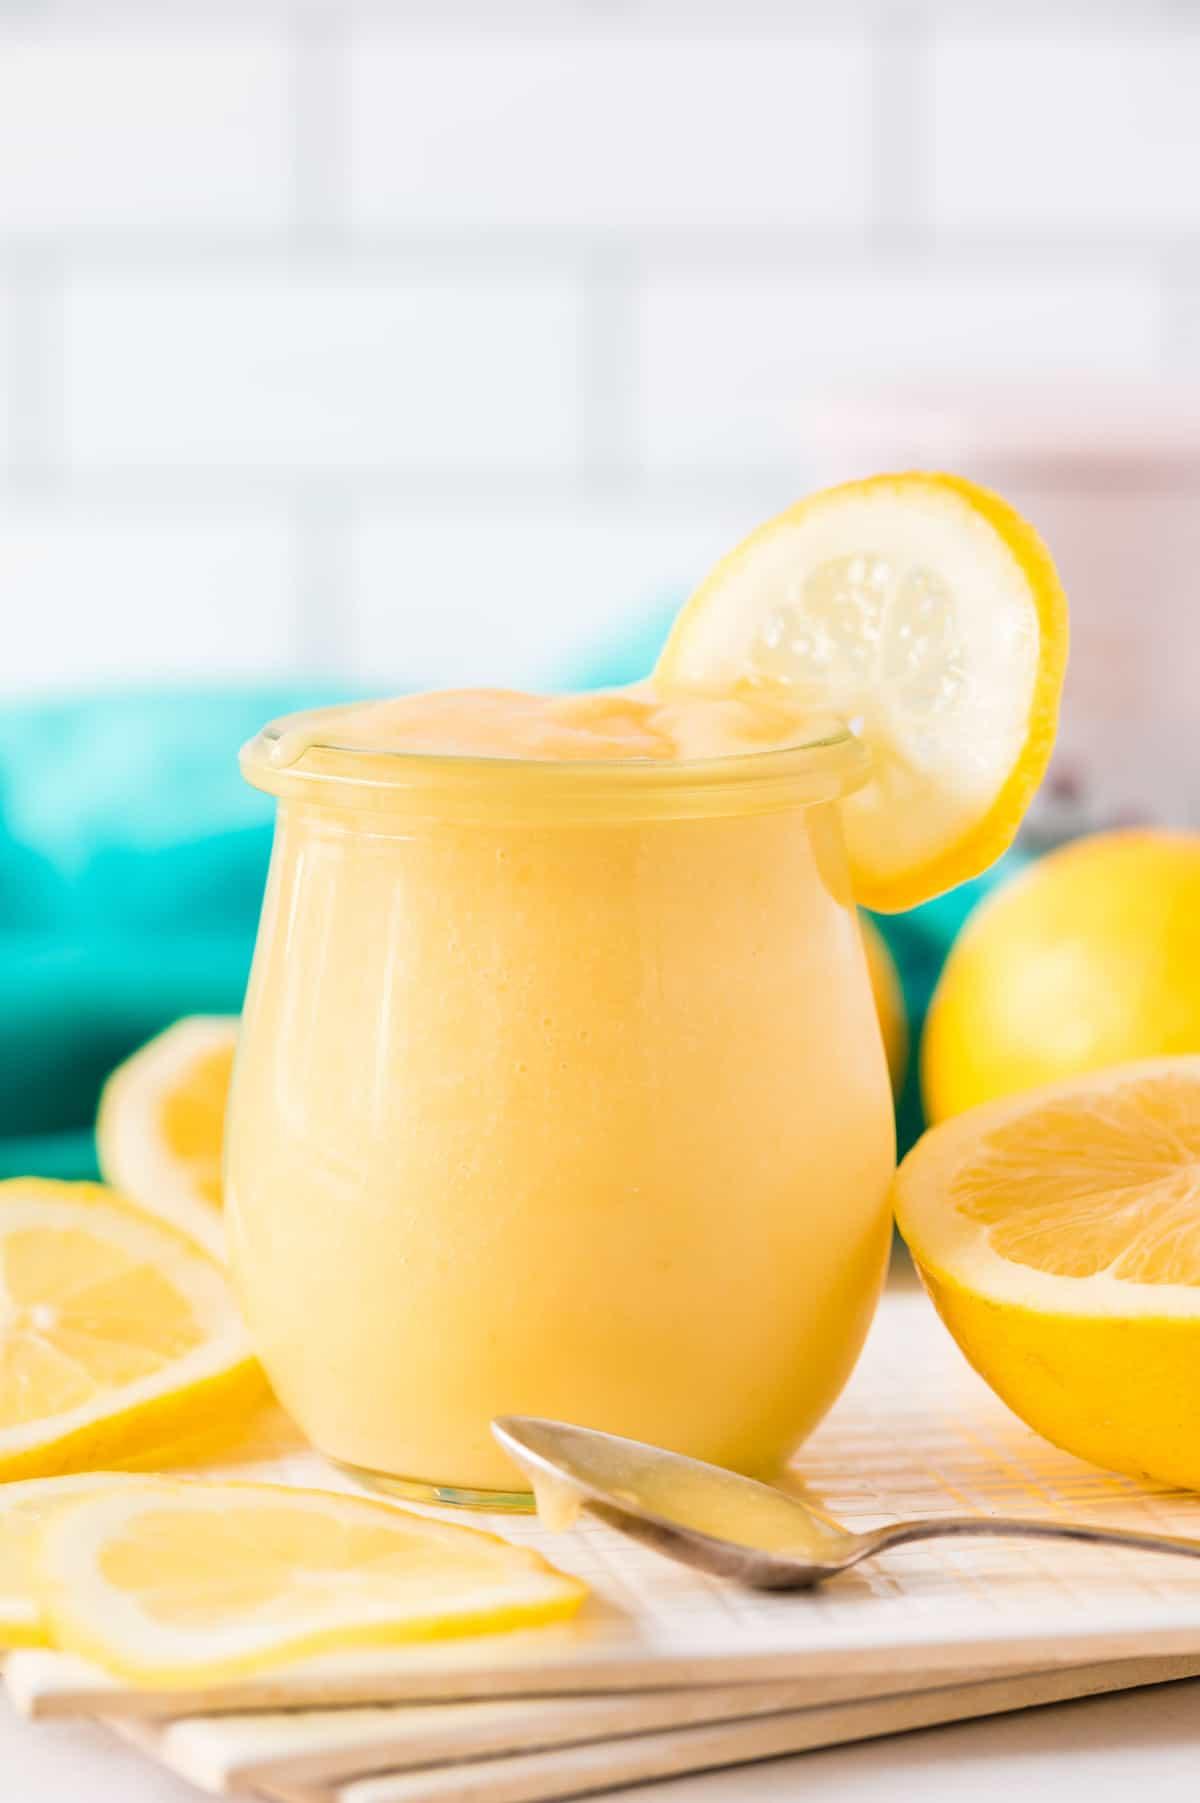 Lemon curd in a jar garnished with a wheel of fresh lemon.